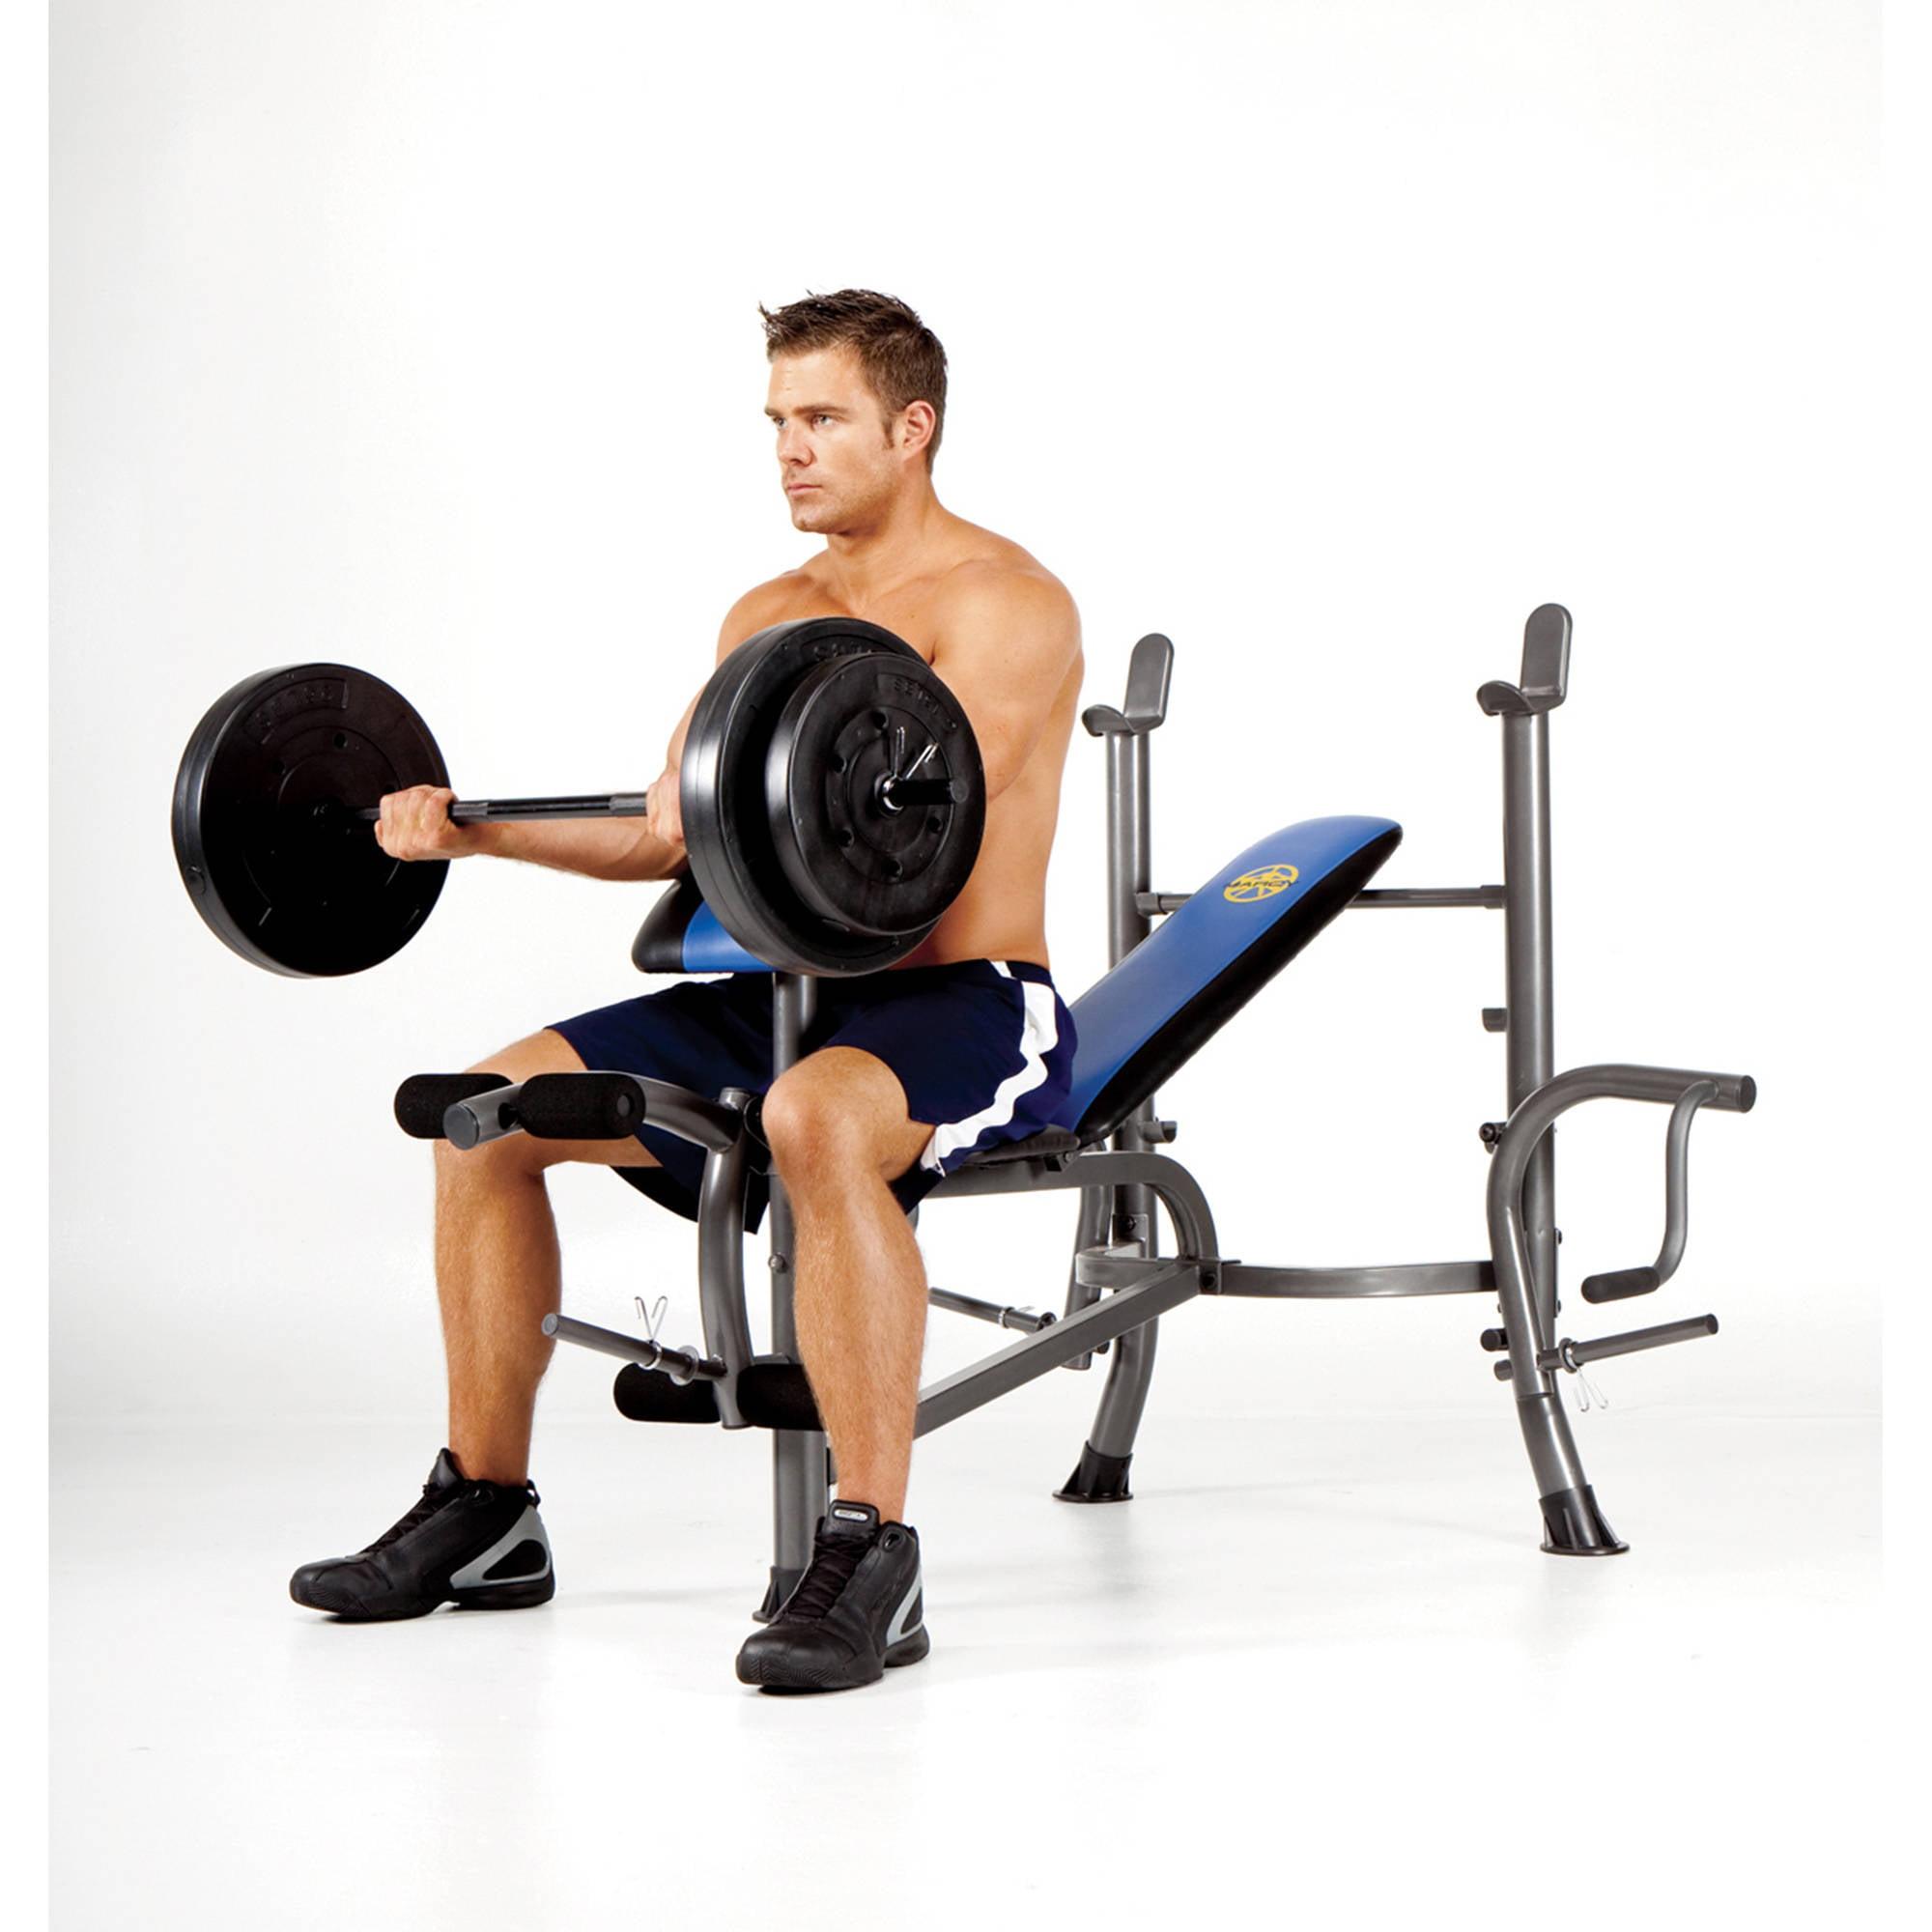 Marcy Standard Bench w/ 80lb Weight Set: MWB-36780B